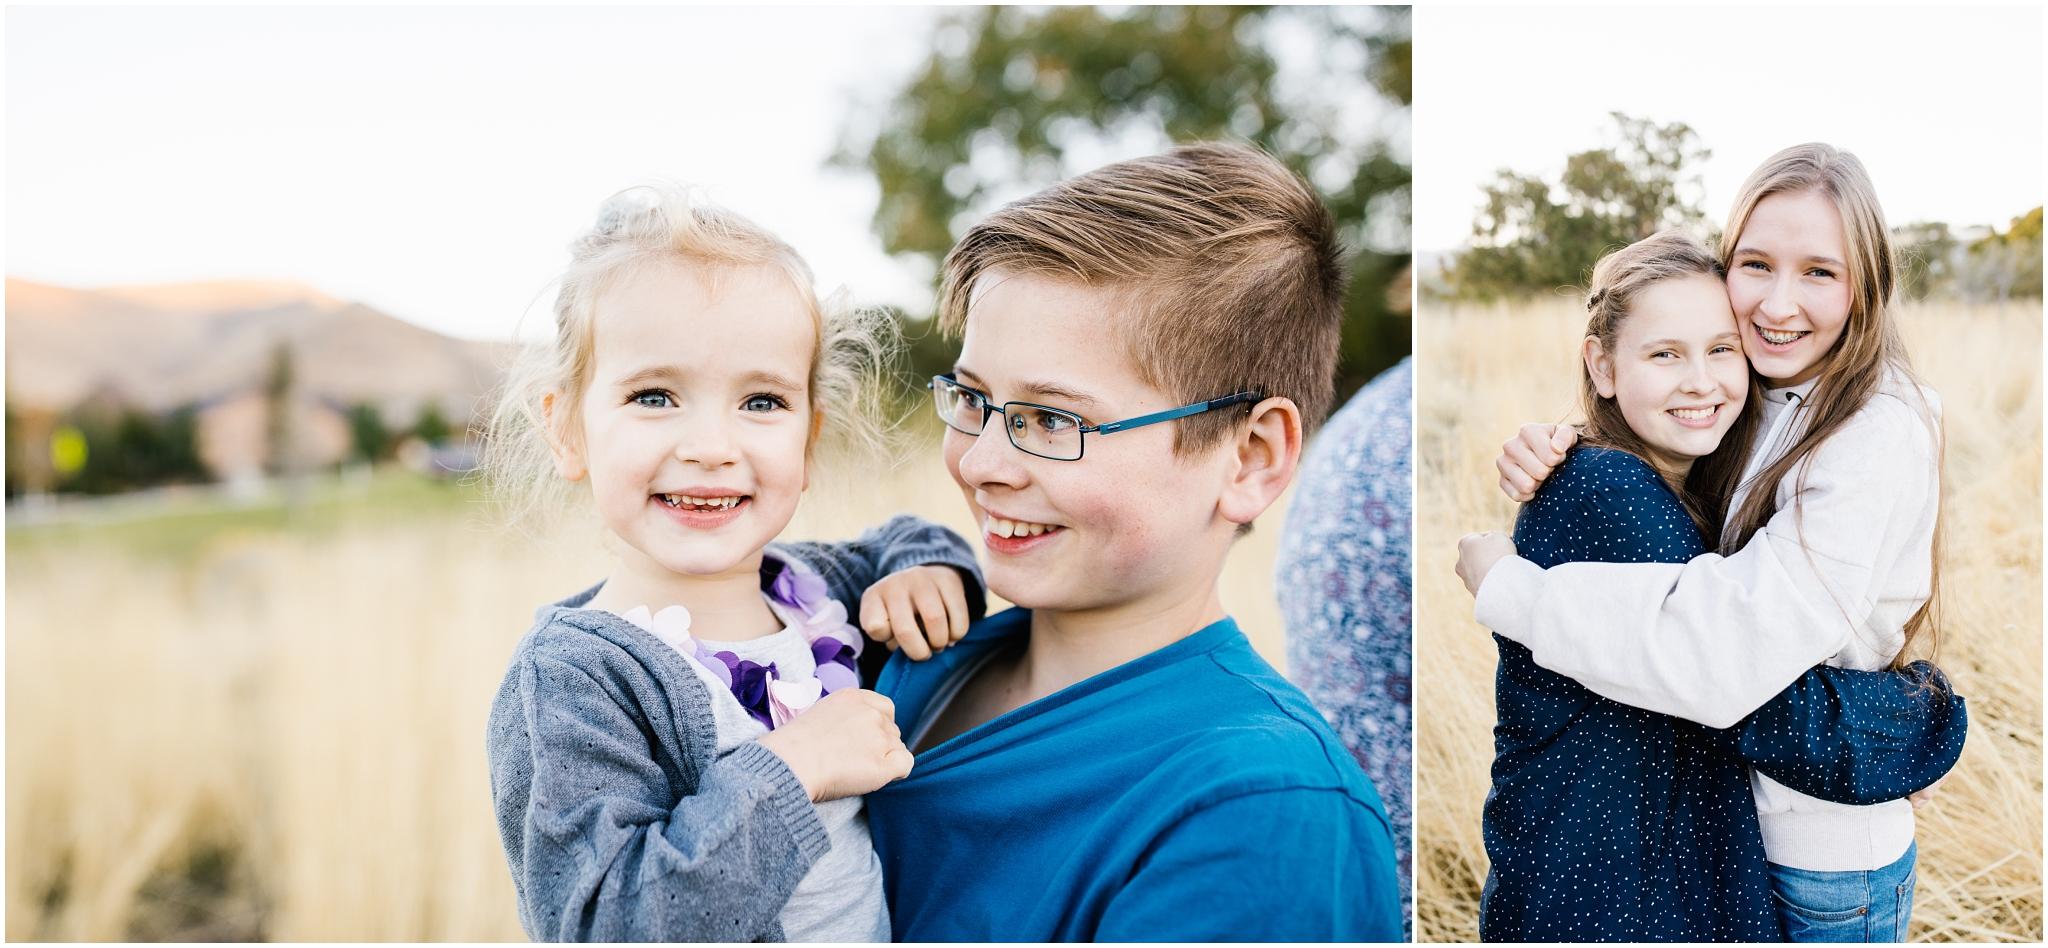 Jaursch-180_Lizzie-B-Imagery-Utah-Family-Photographer-Salt-Lake-City-Park-City-Herriman-Utah-County.jpg